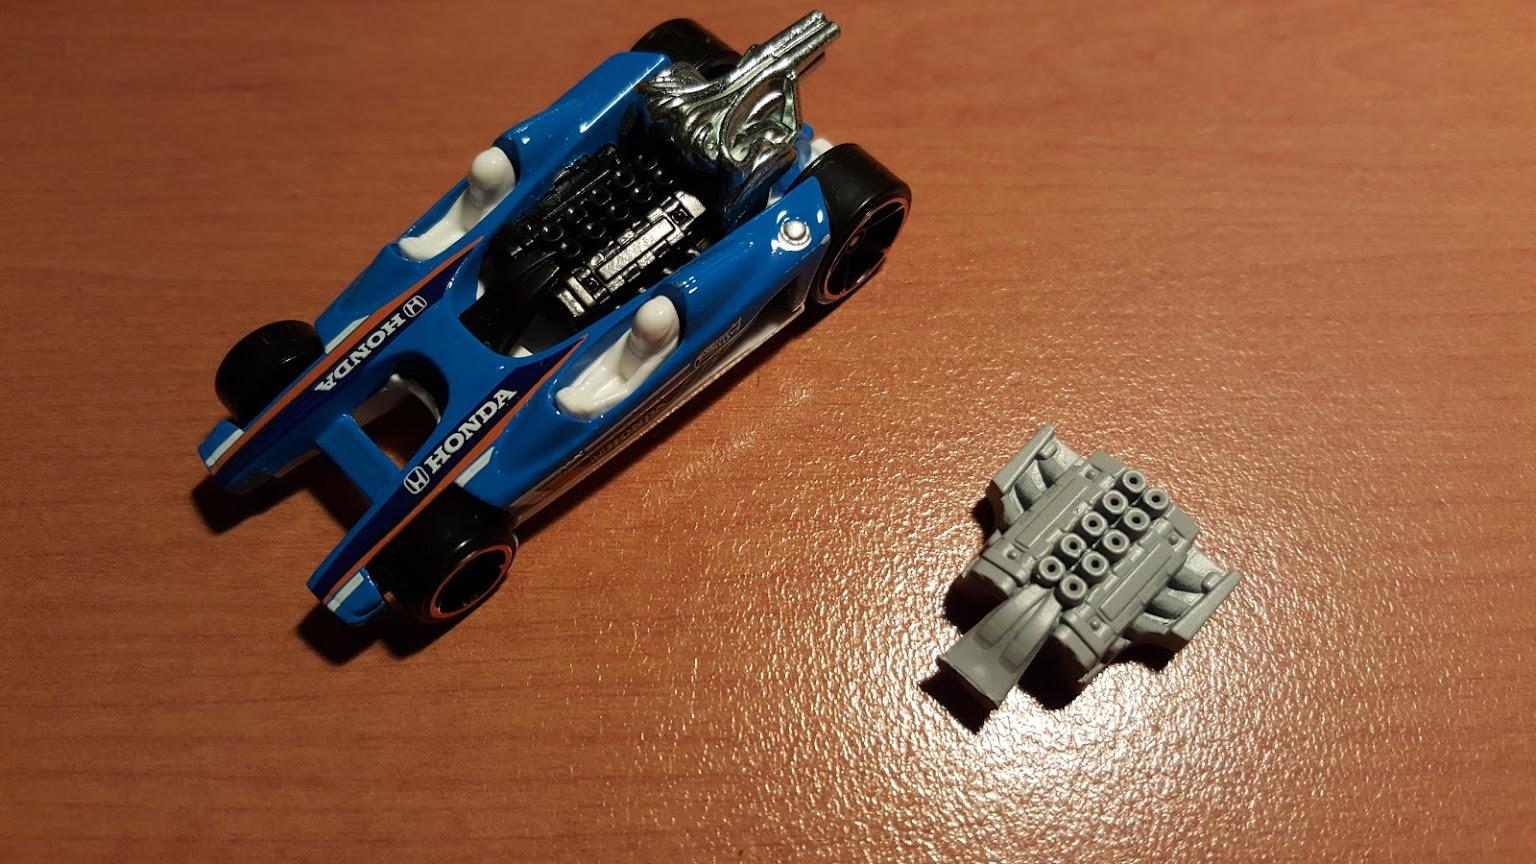 Hot Wheels Car Engine Cheap Toys Kids Toys